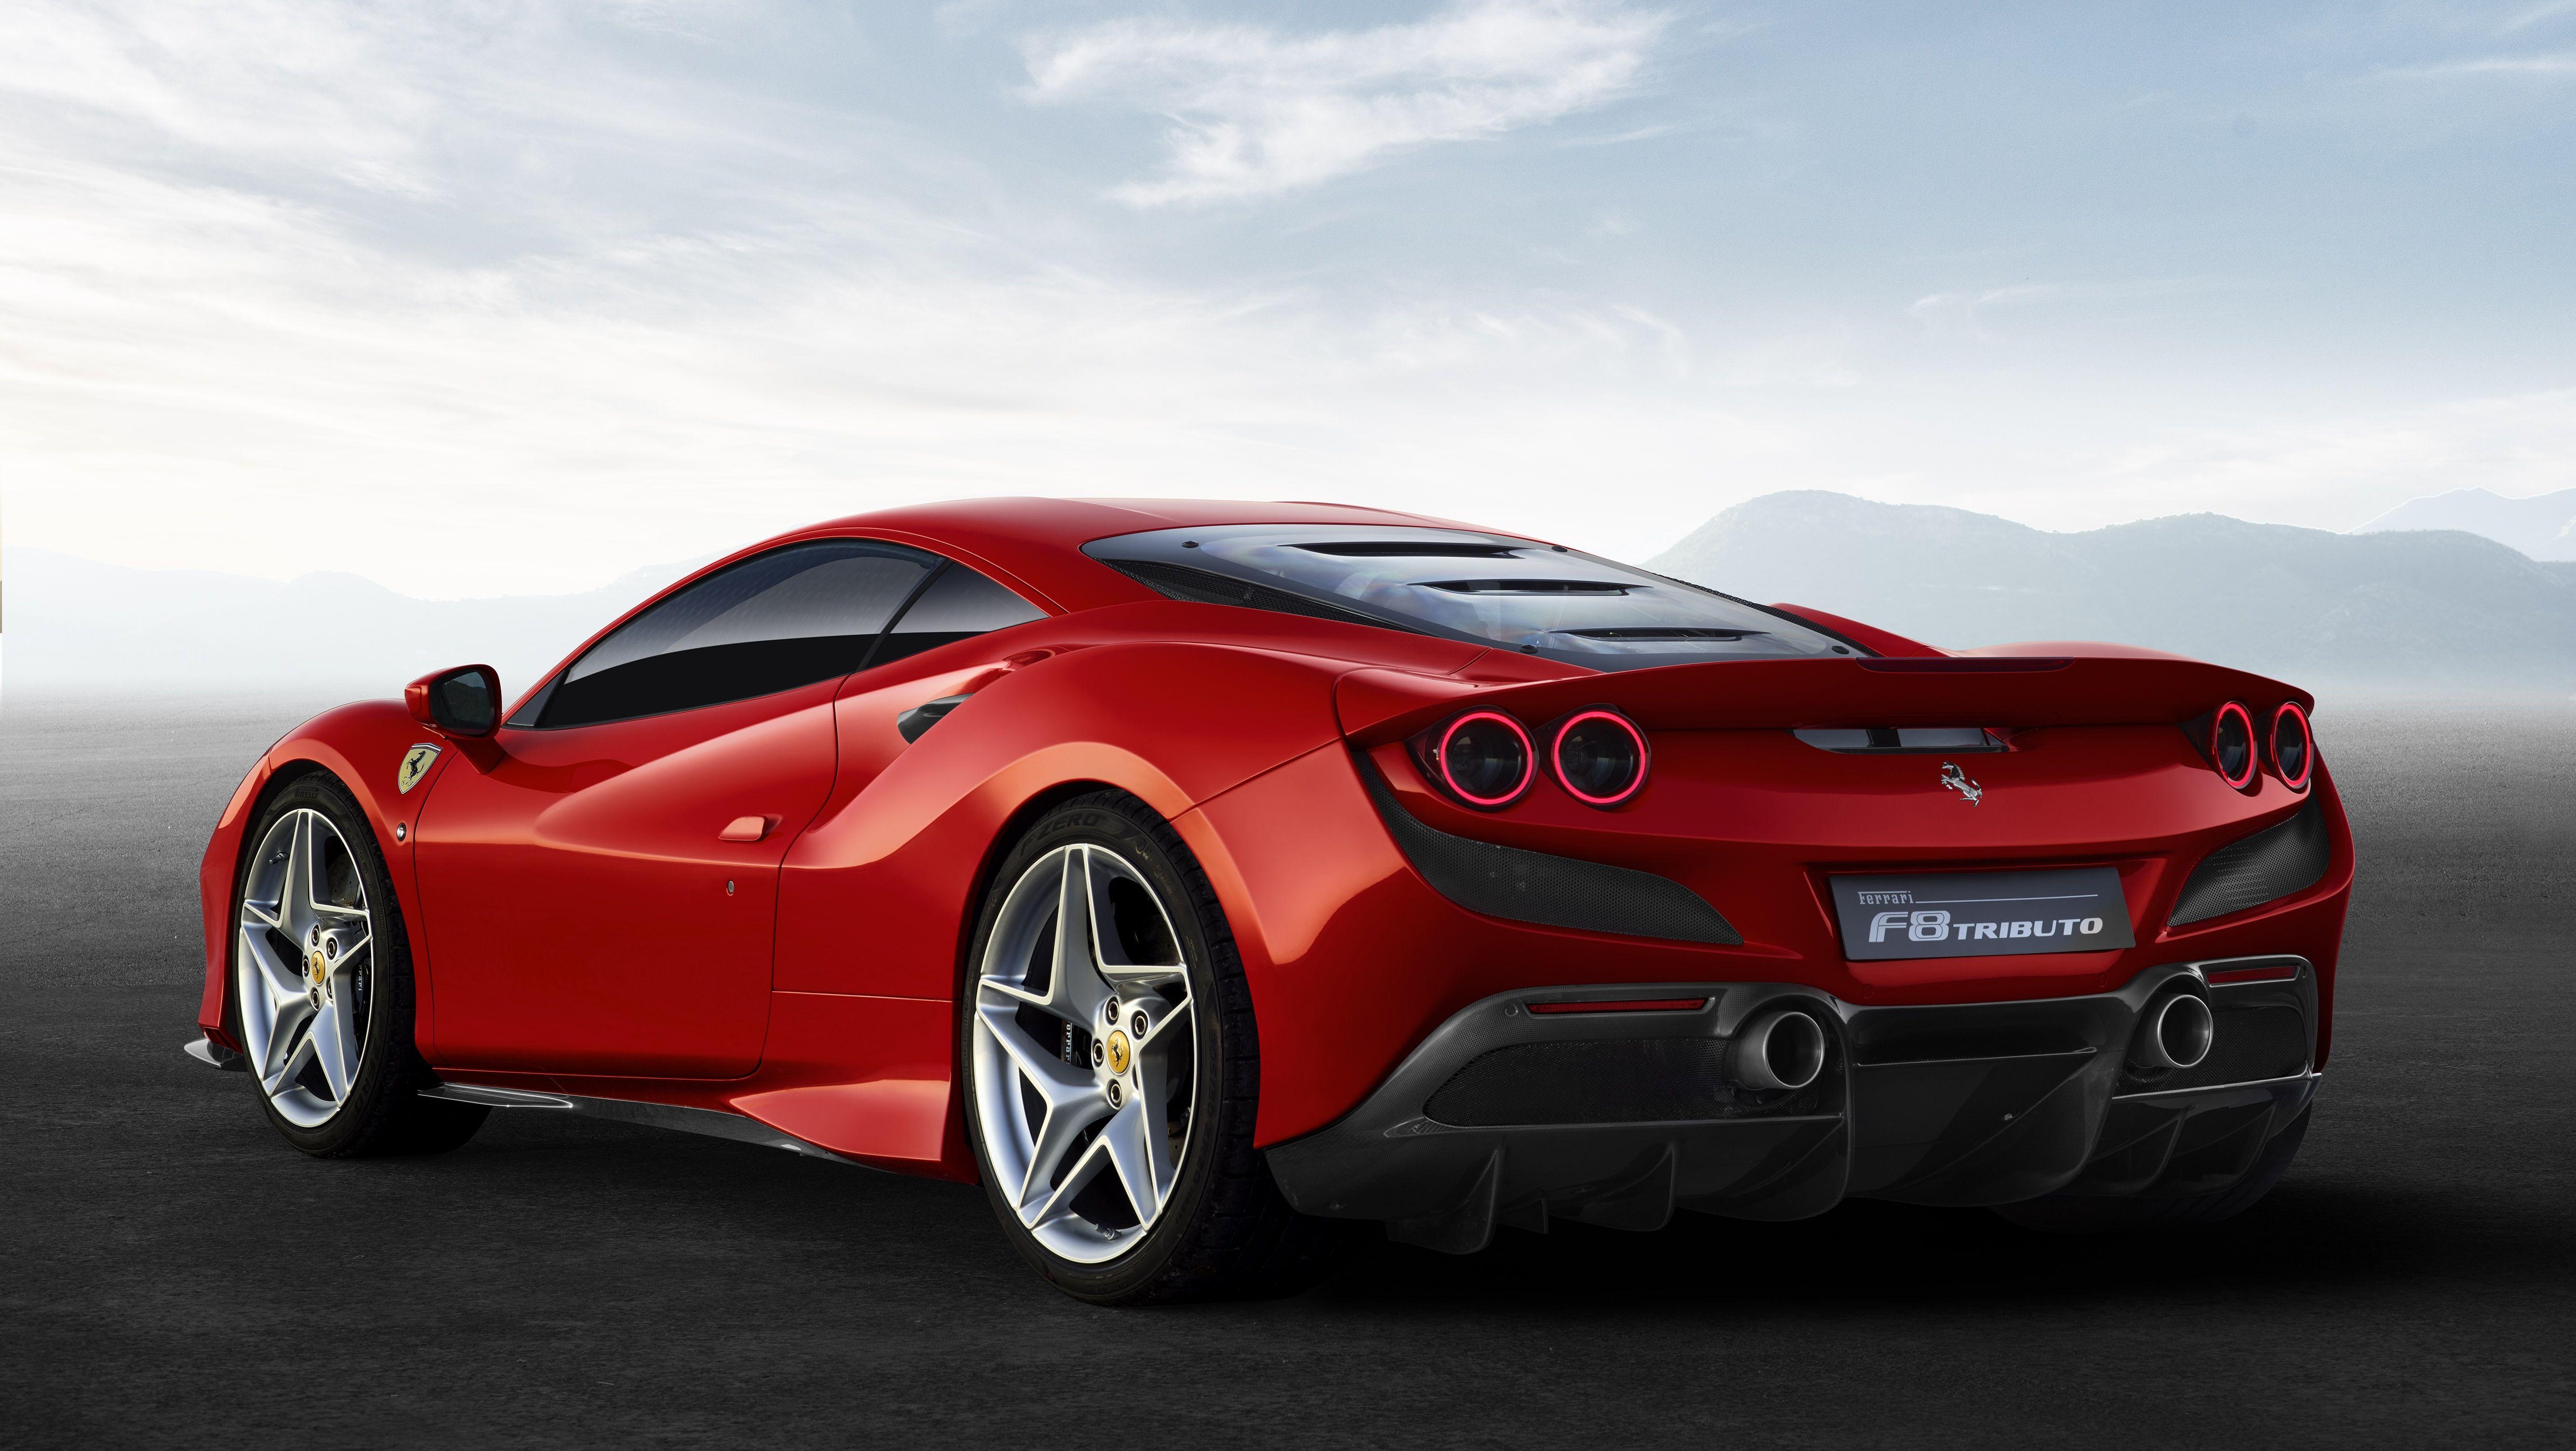 2020 Ferrari F8 Tributo Review And Specs Top Speed Sports Car Geneva Motor Show Super Cars